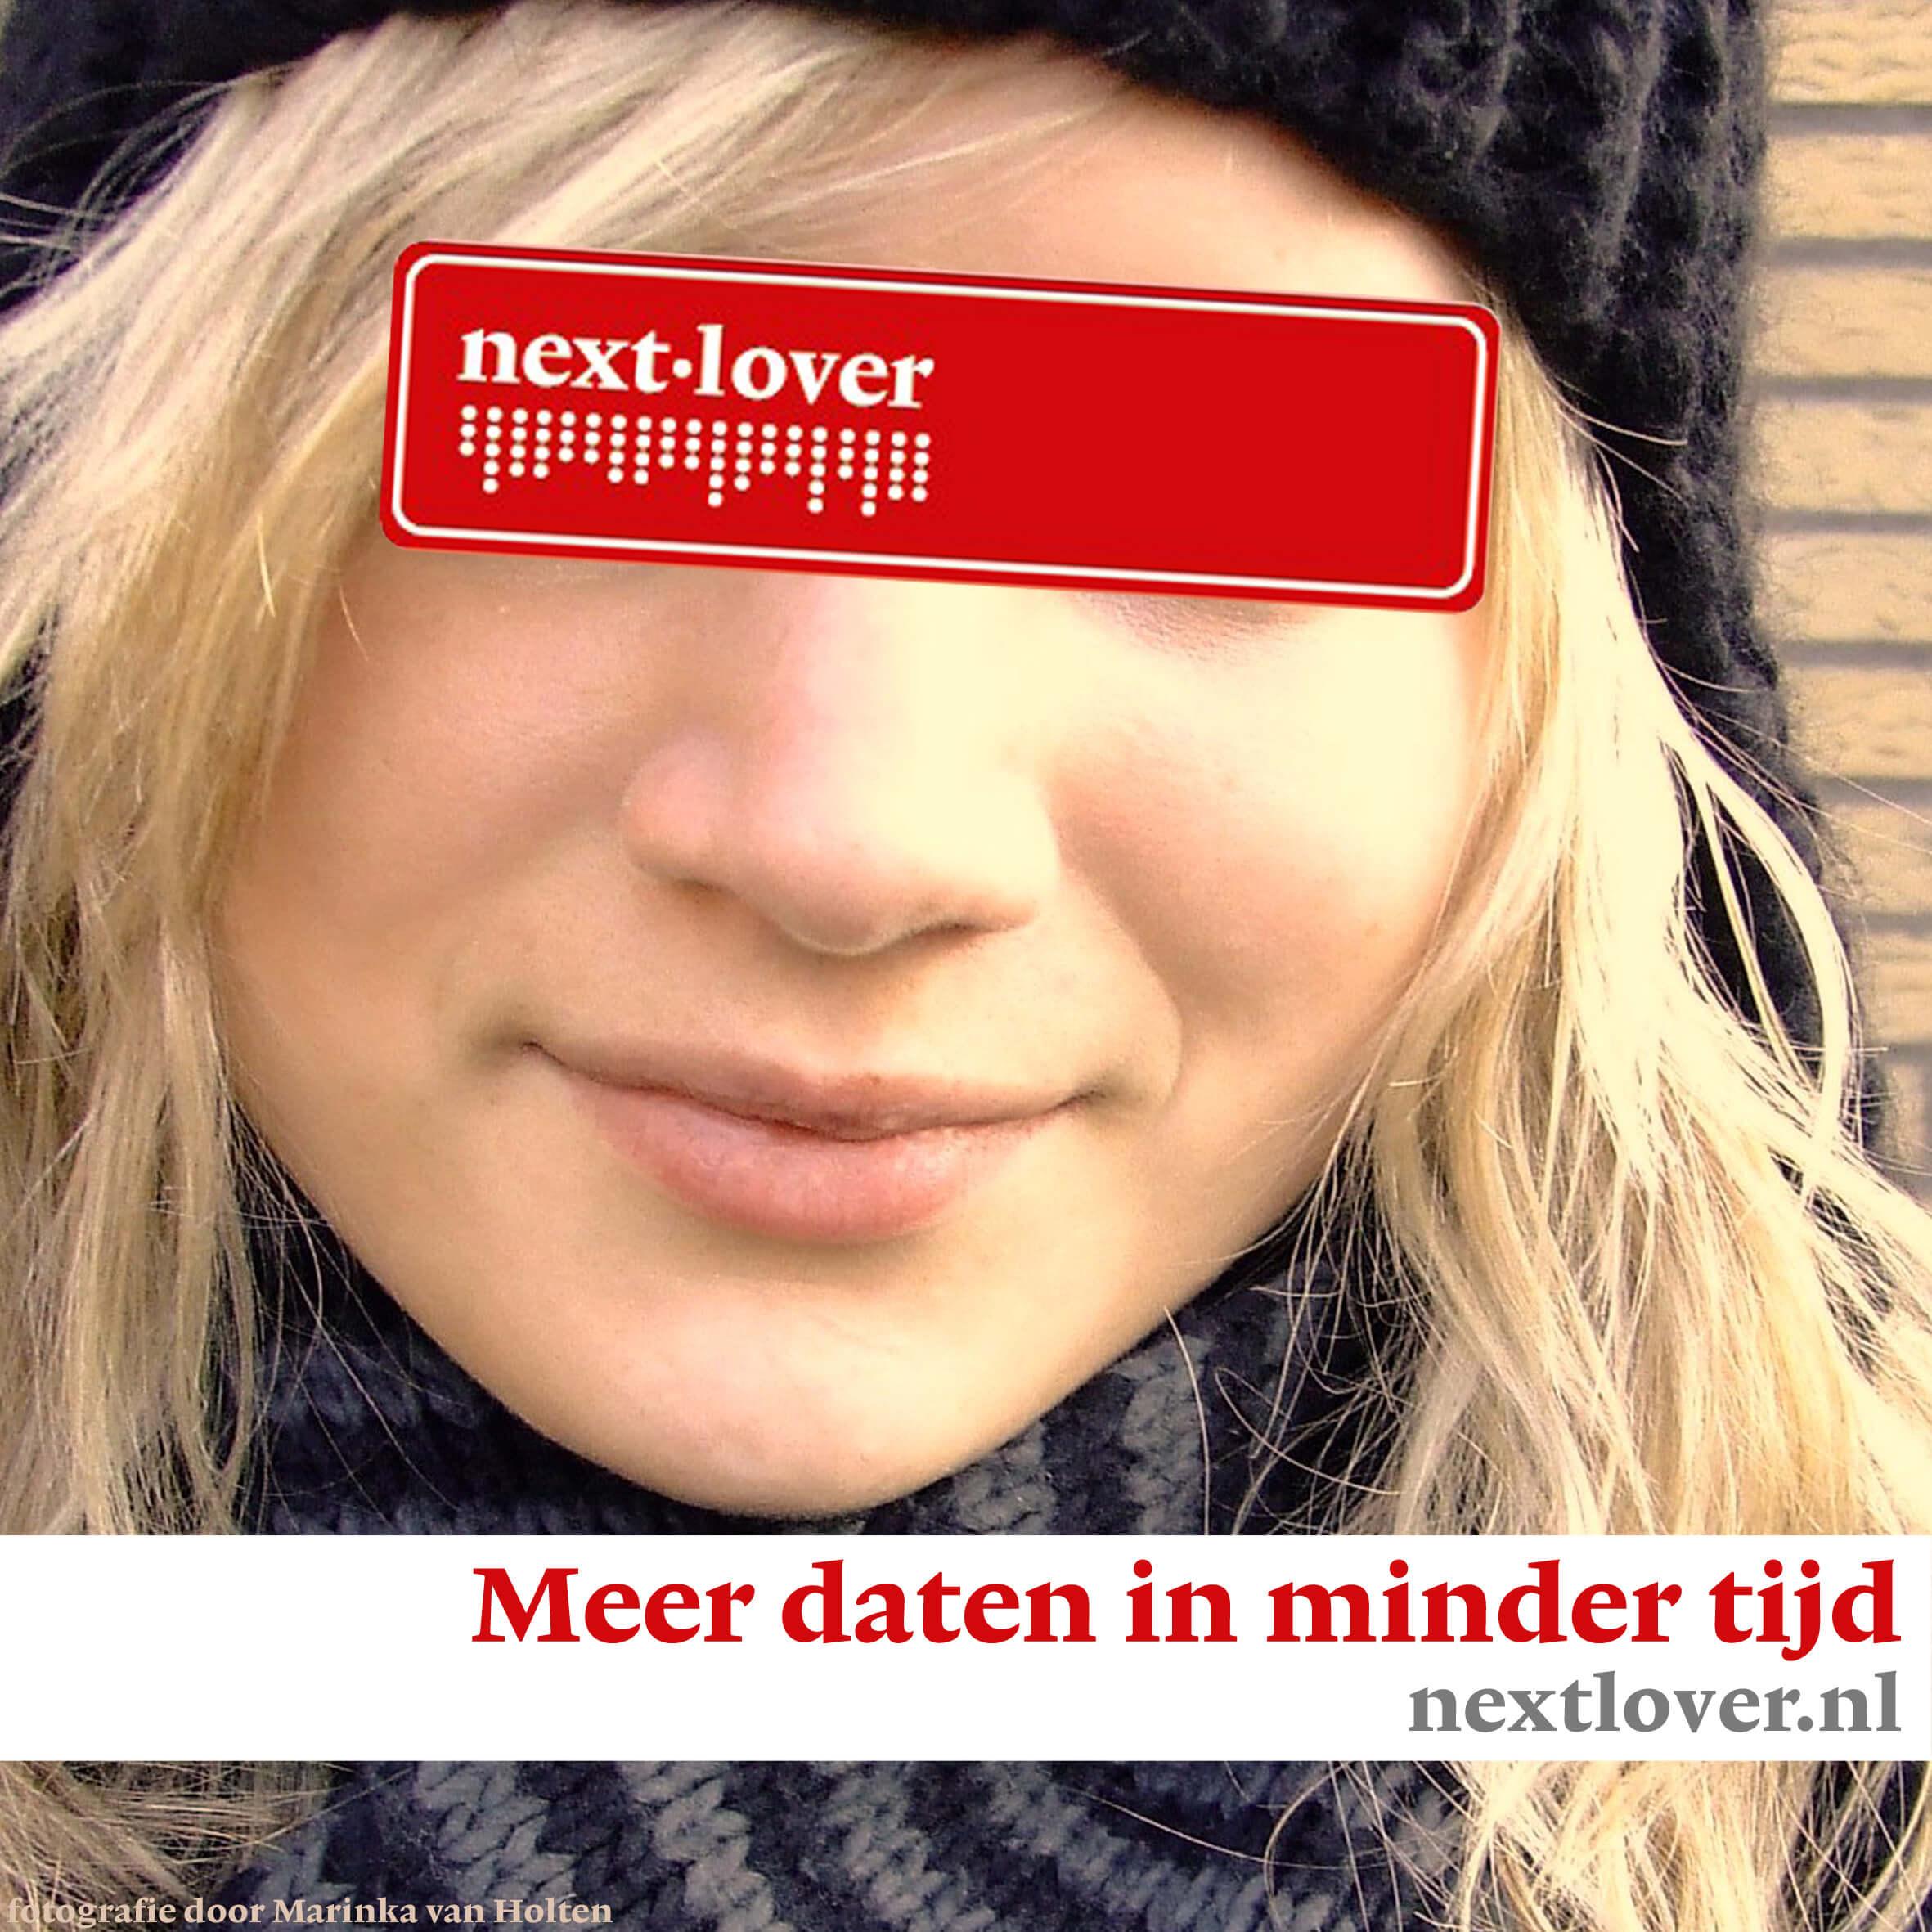 nextlover advertentie vrouw